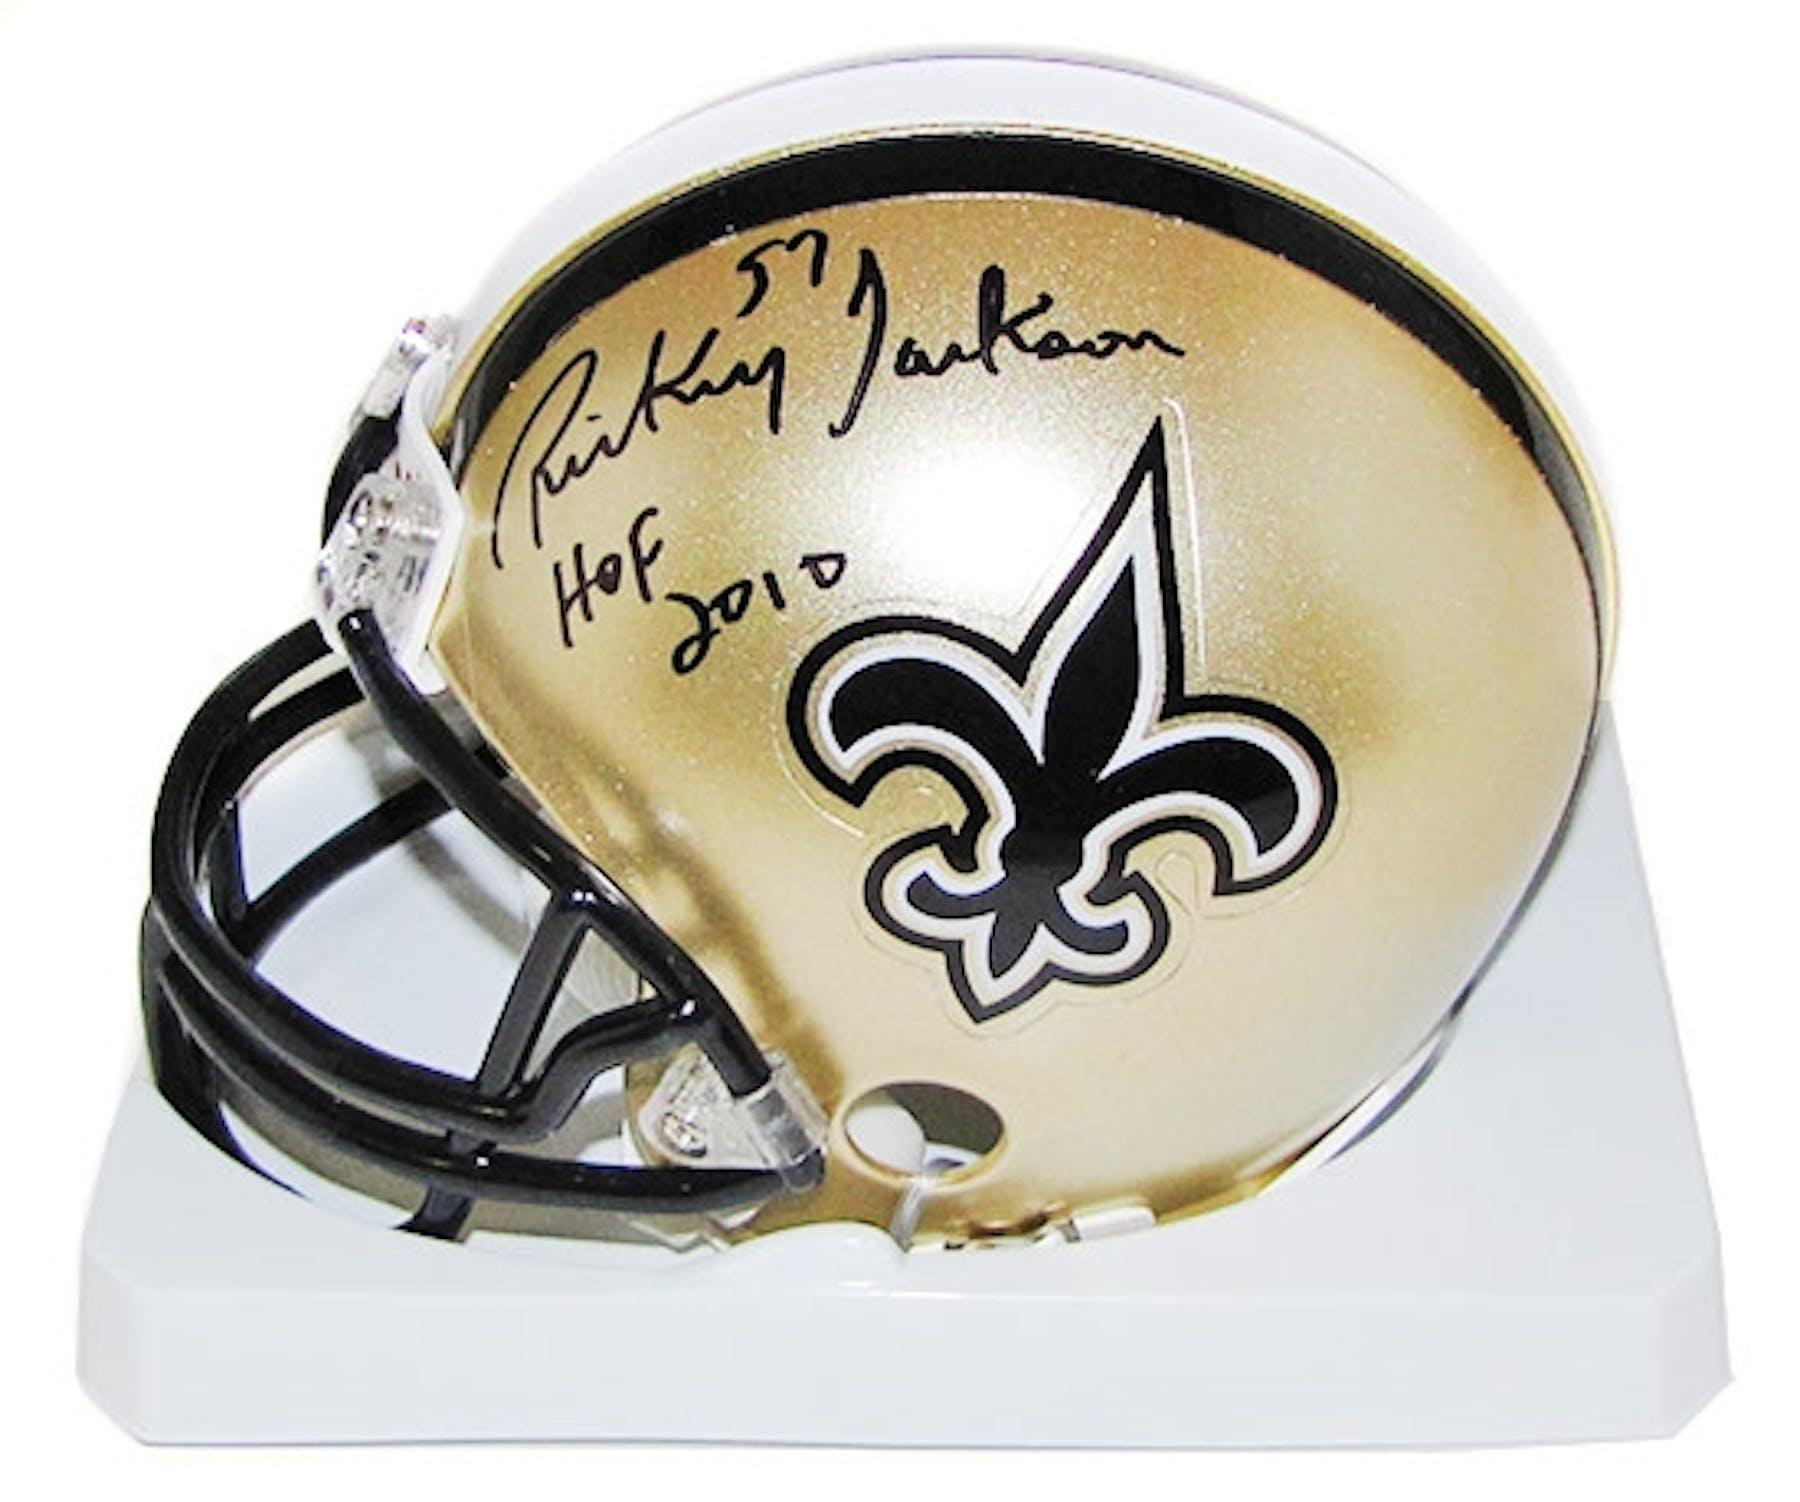 e8a319e2e5f Rickey Jackson Autographed New Orleans Saints Mini Helmet